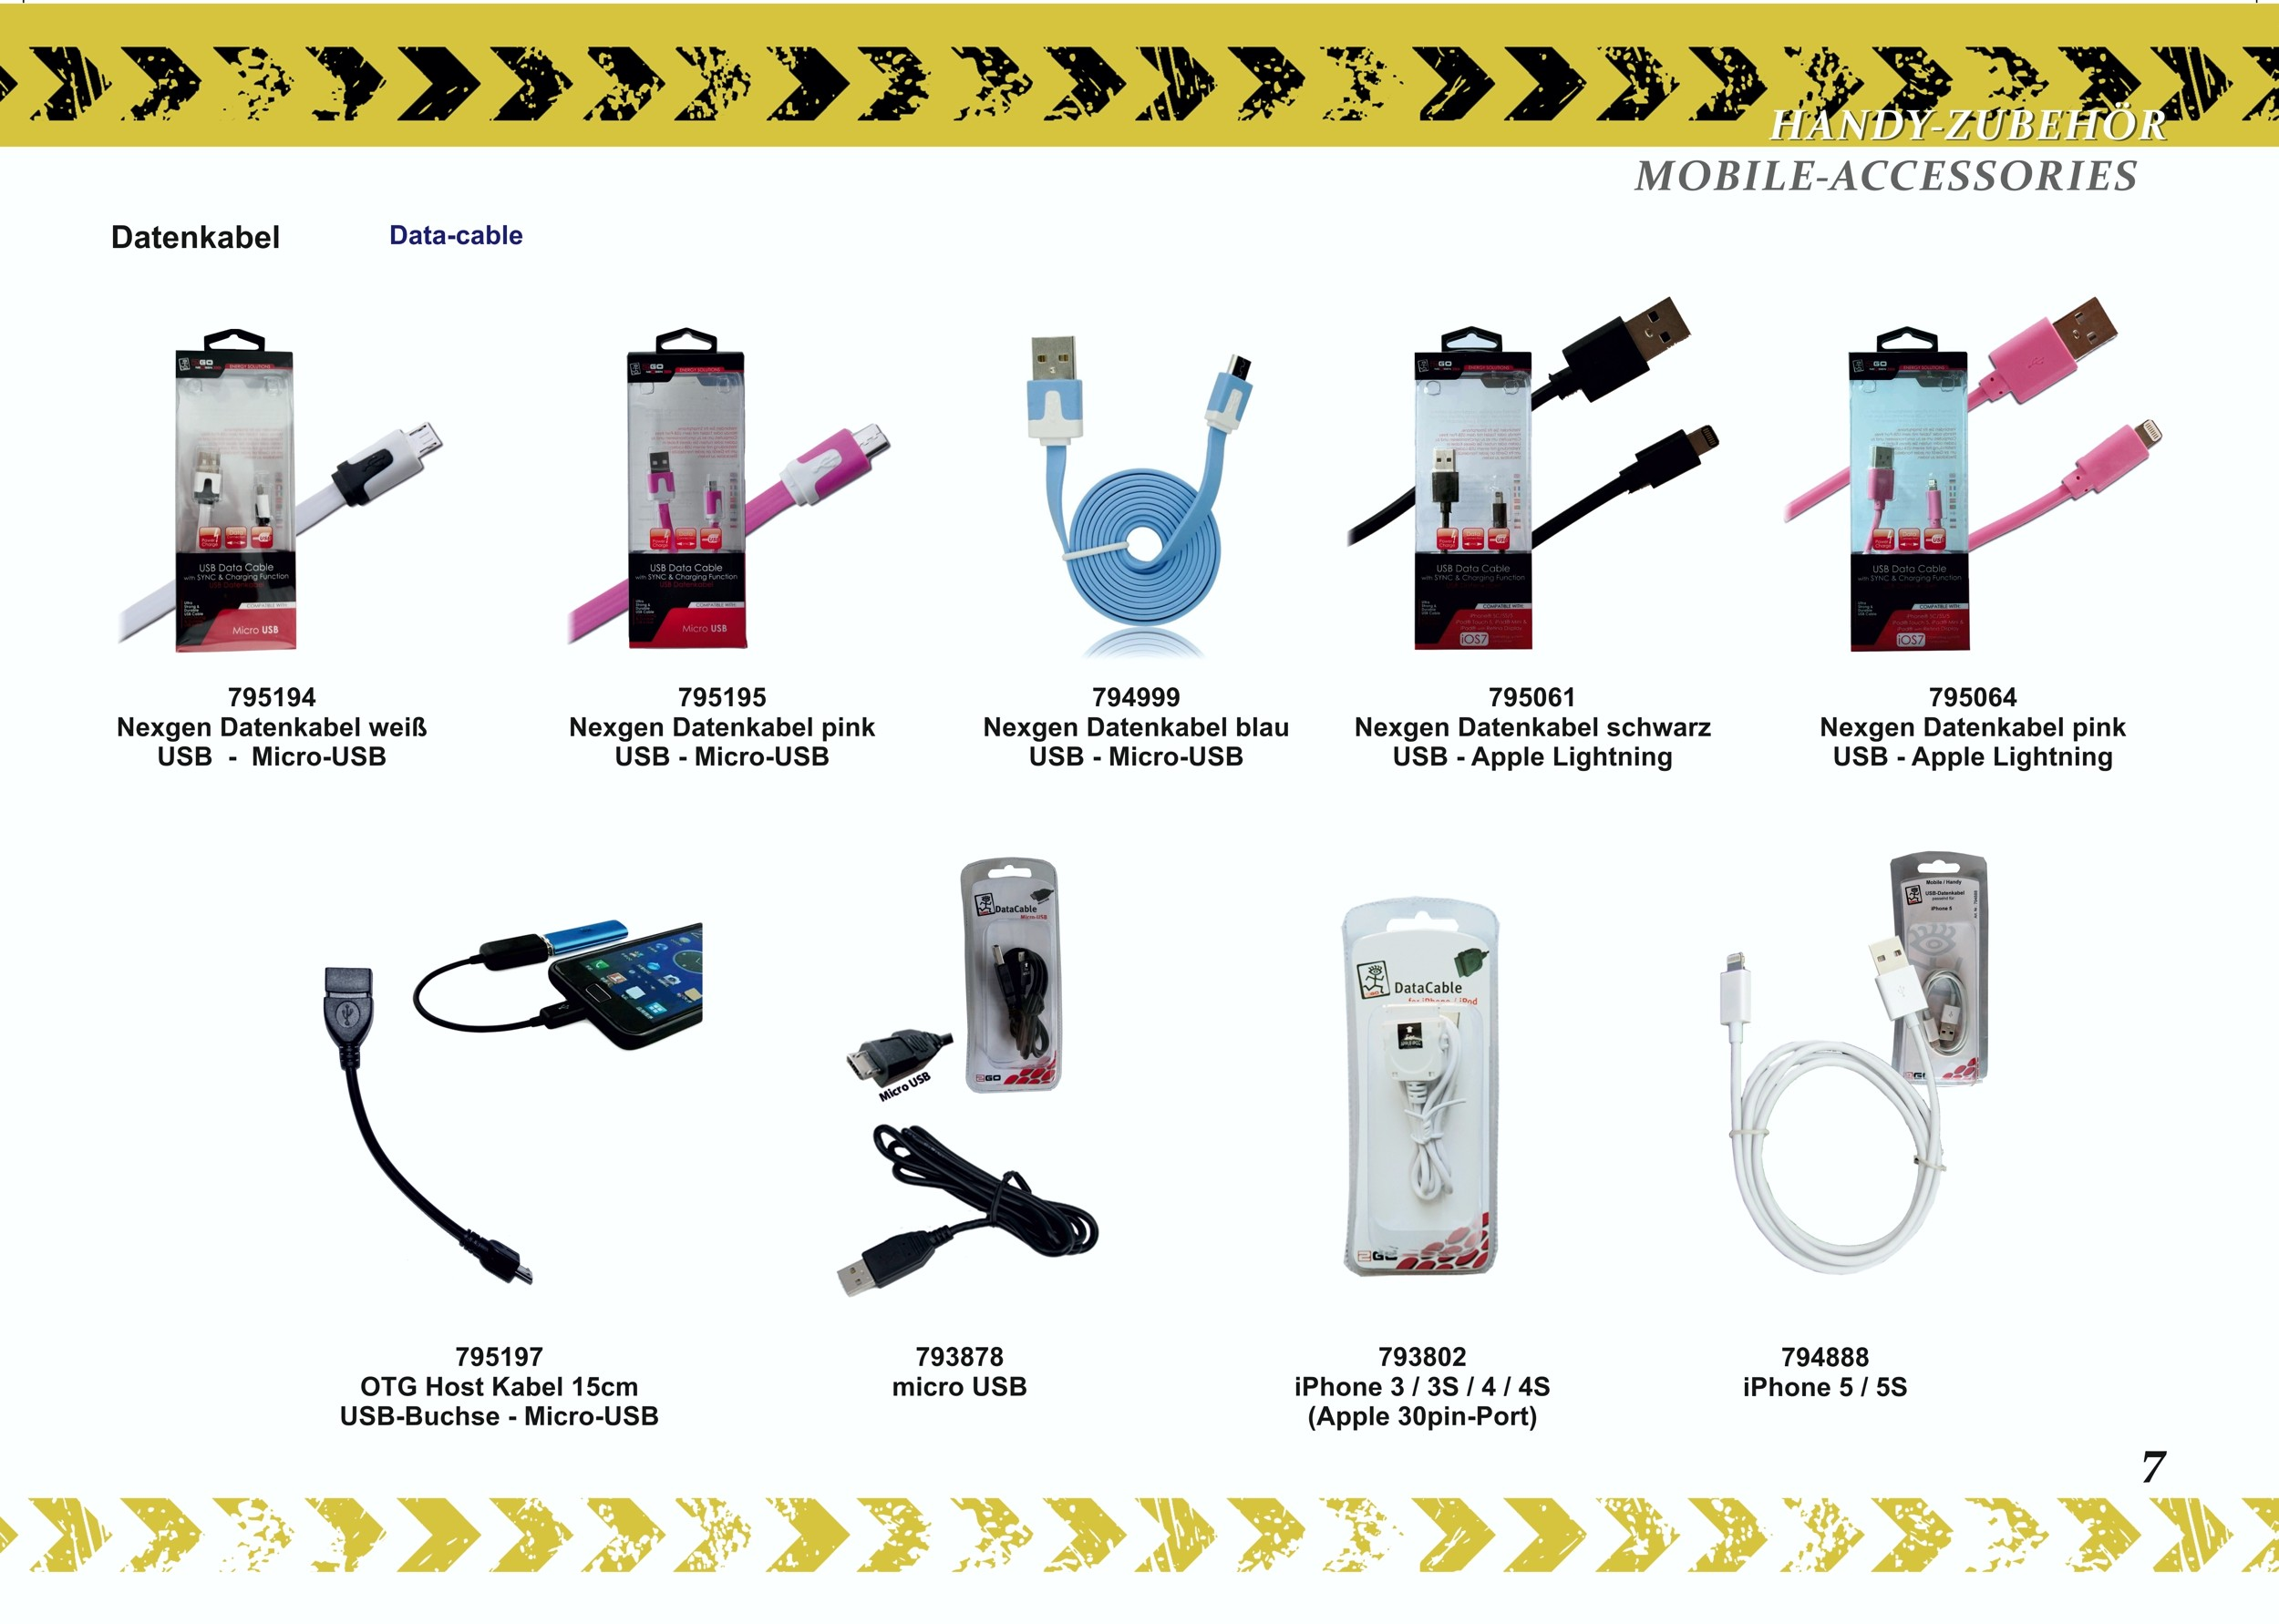 2GO Datenkabel USB - Apple Lightning schwarz – Bild 4